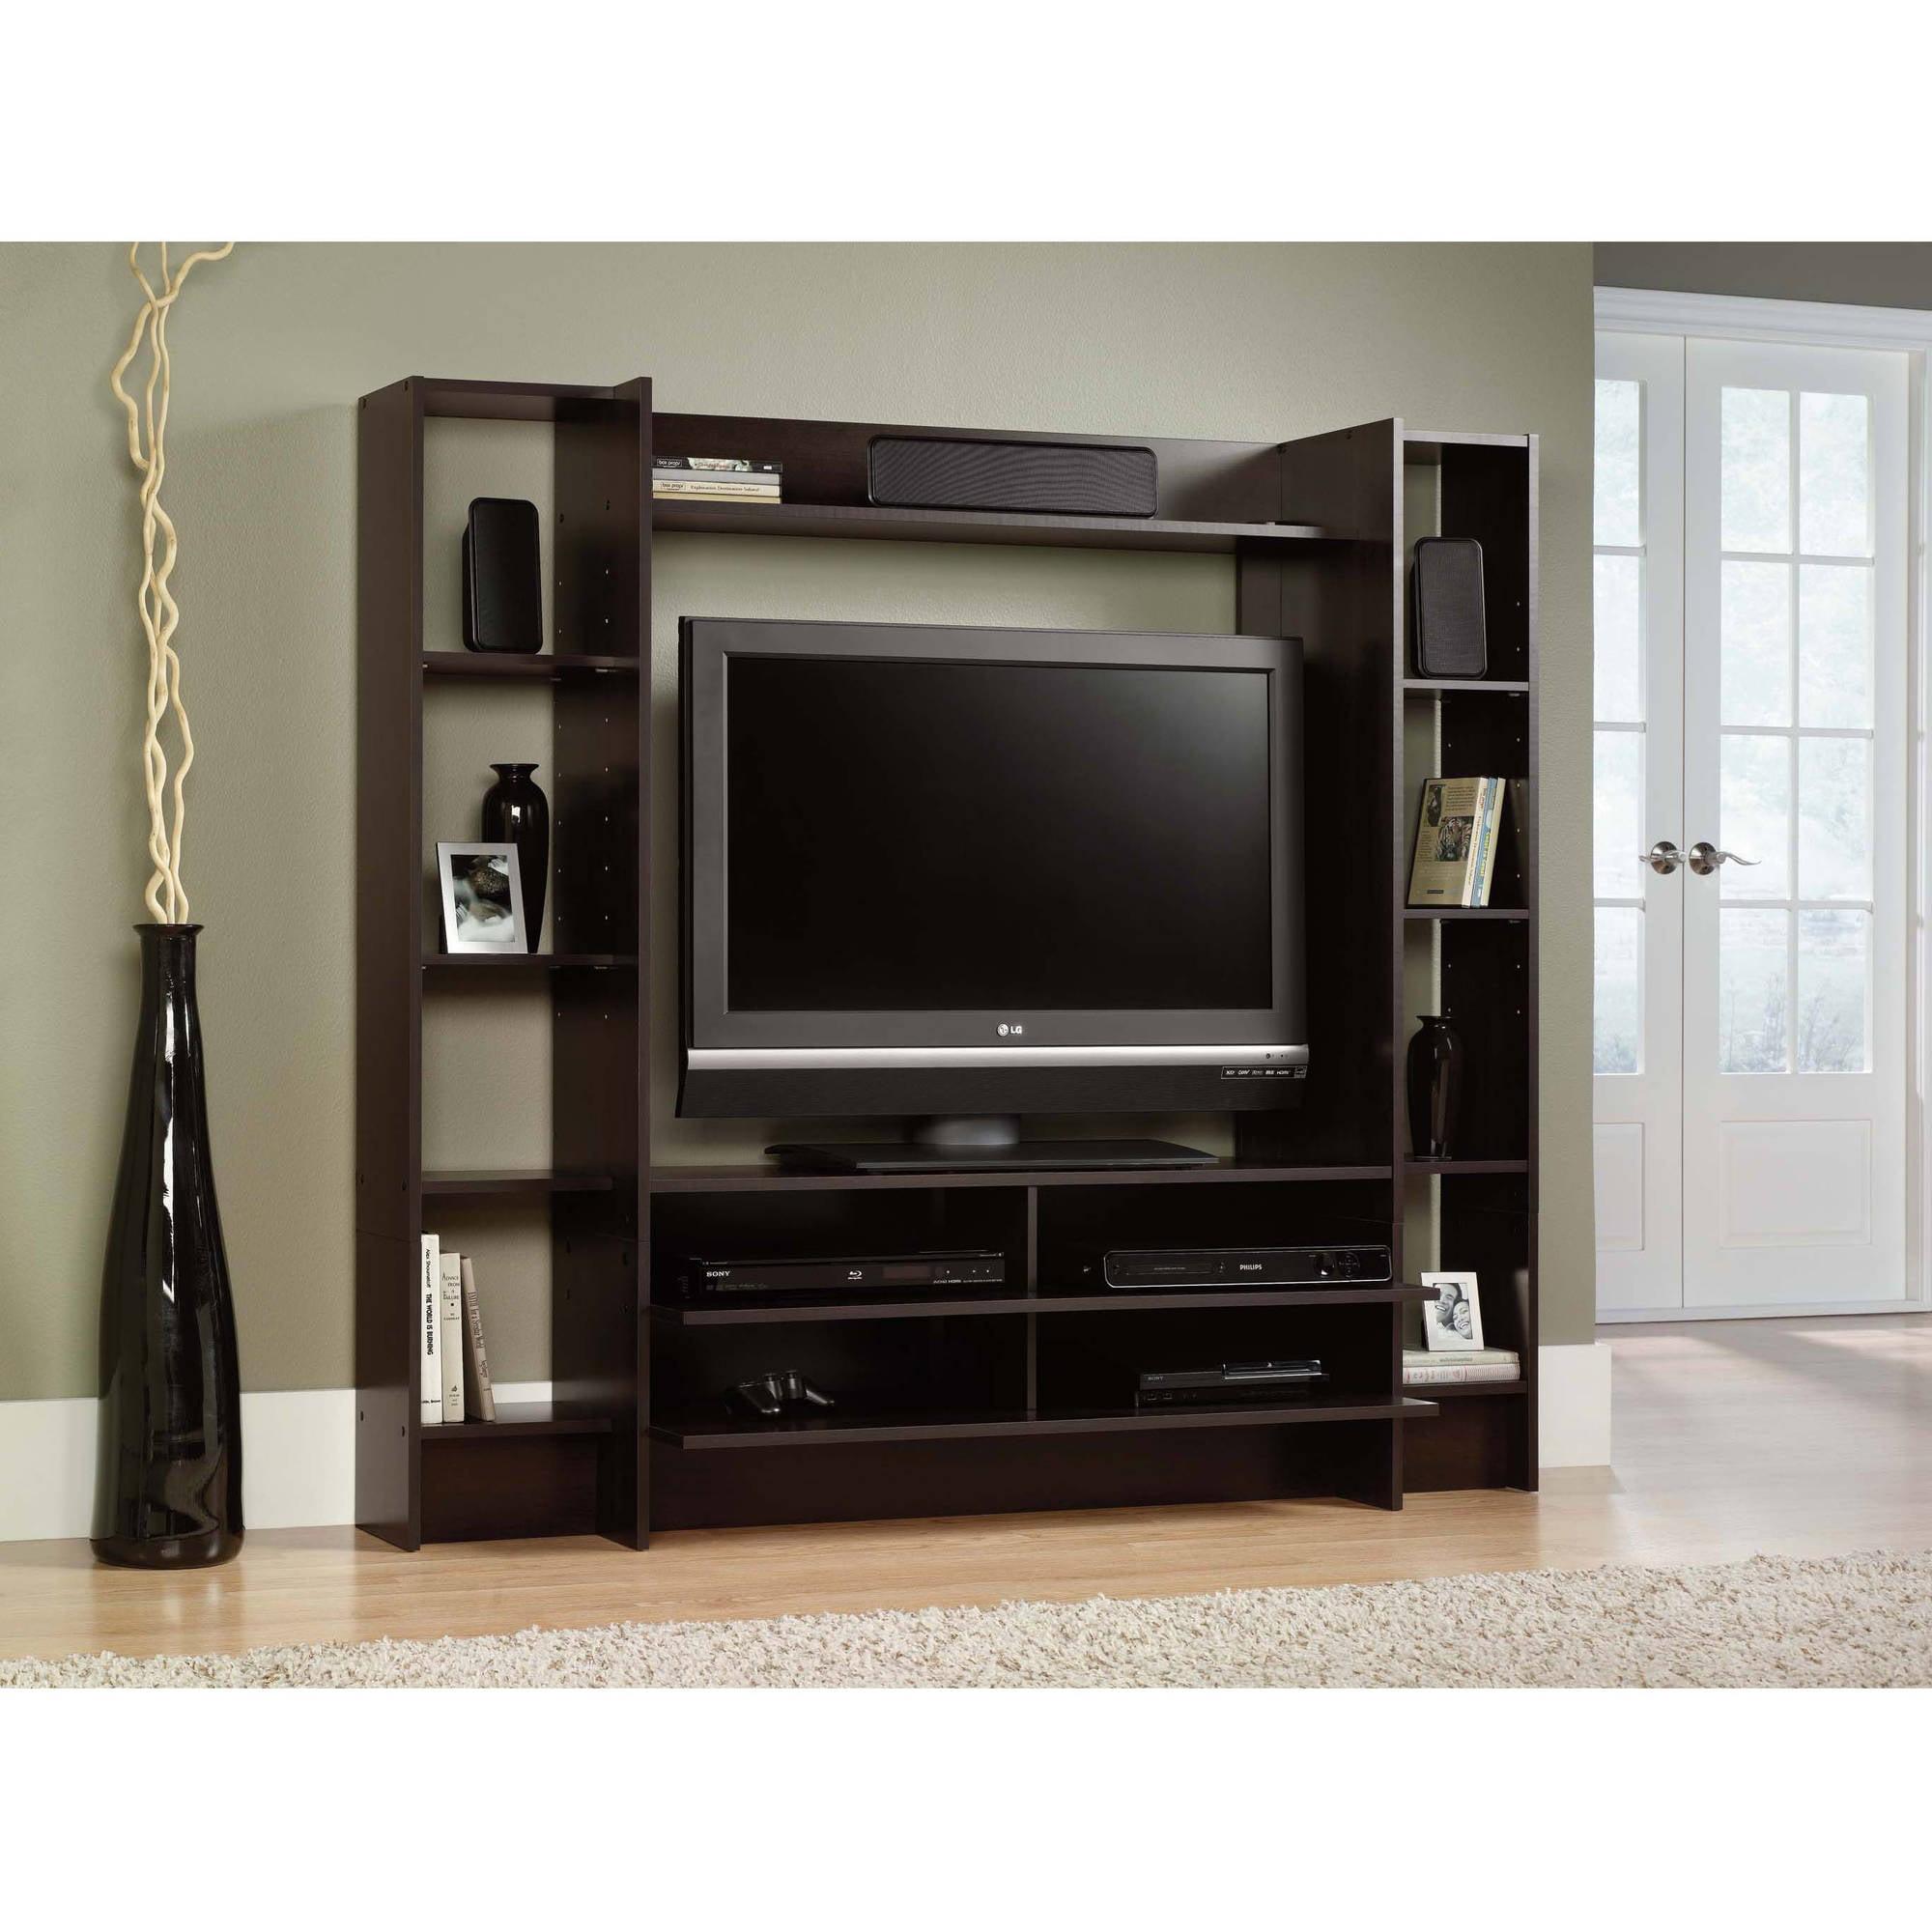 tv stands  entertainment centers  millimartcom -